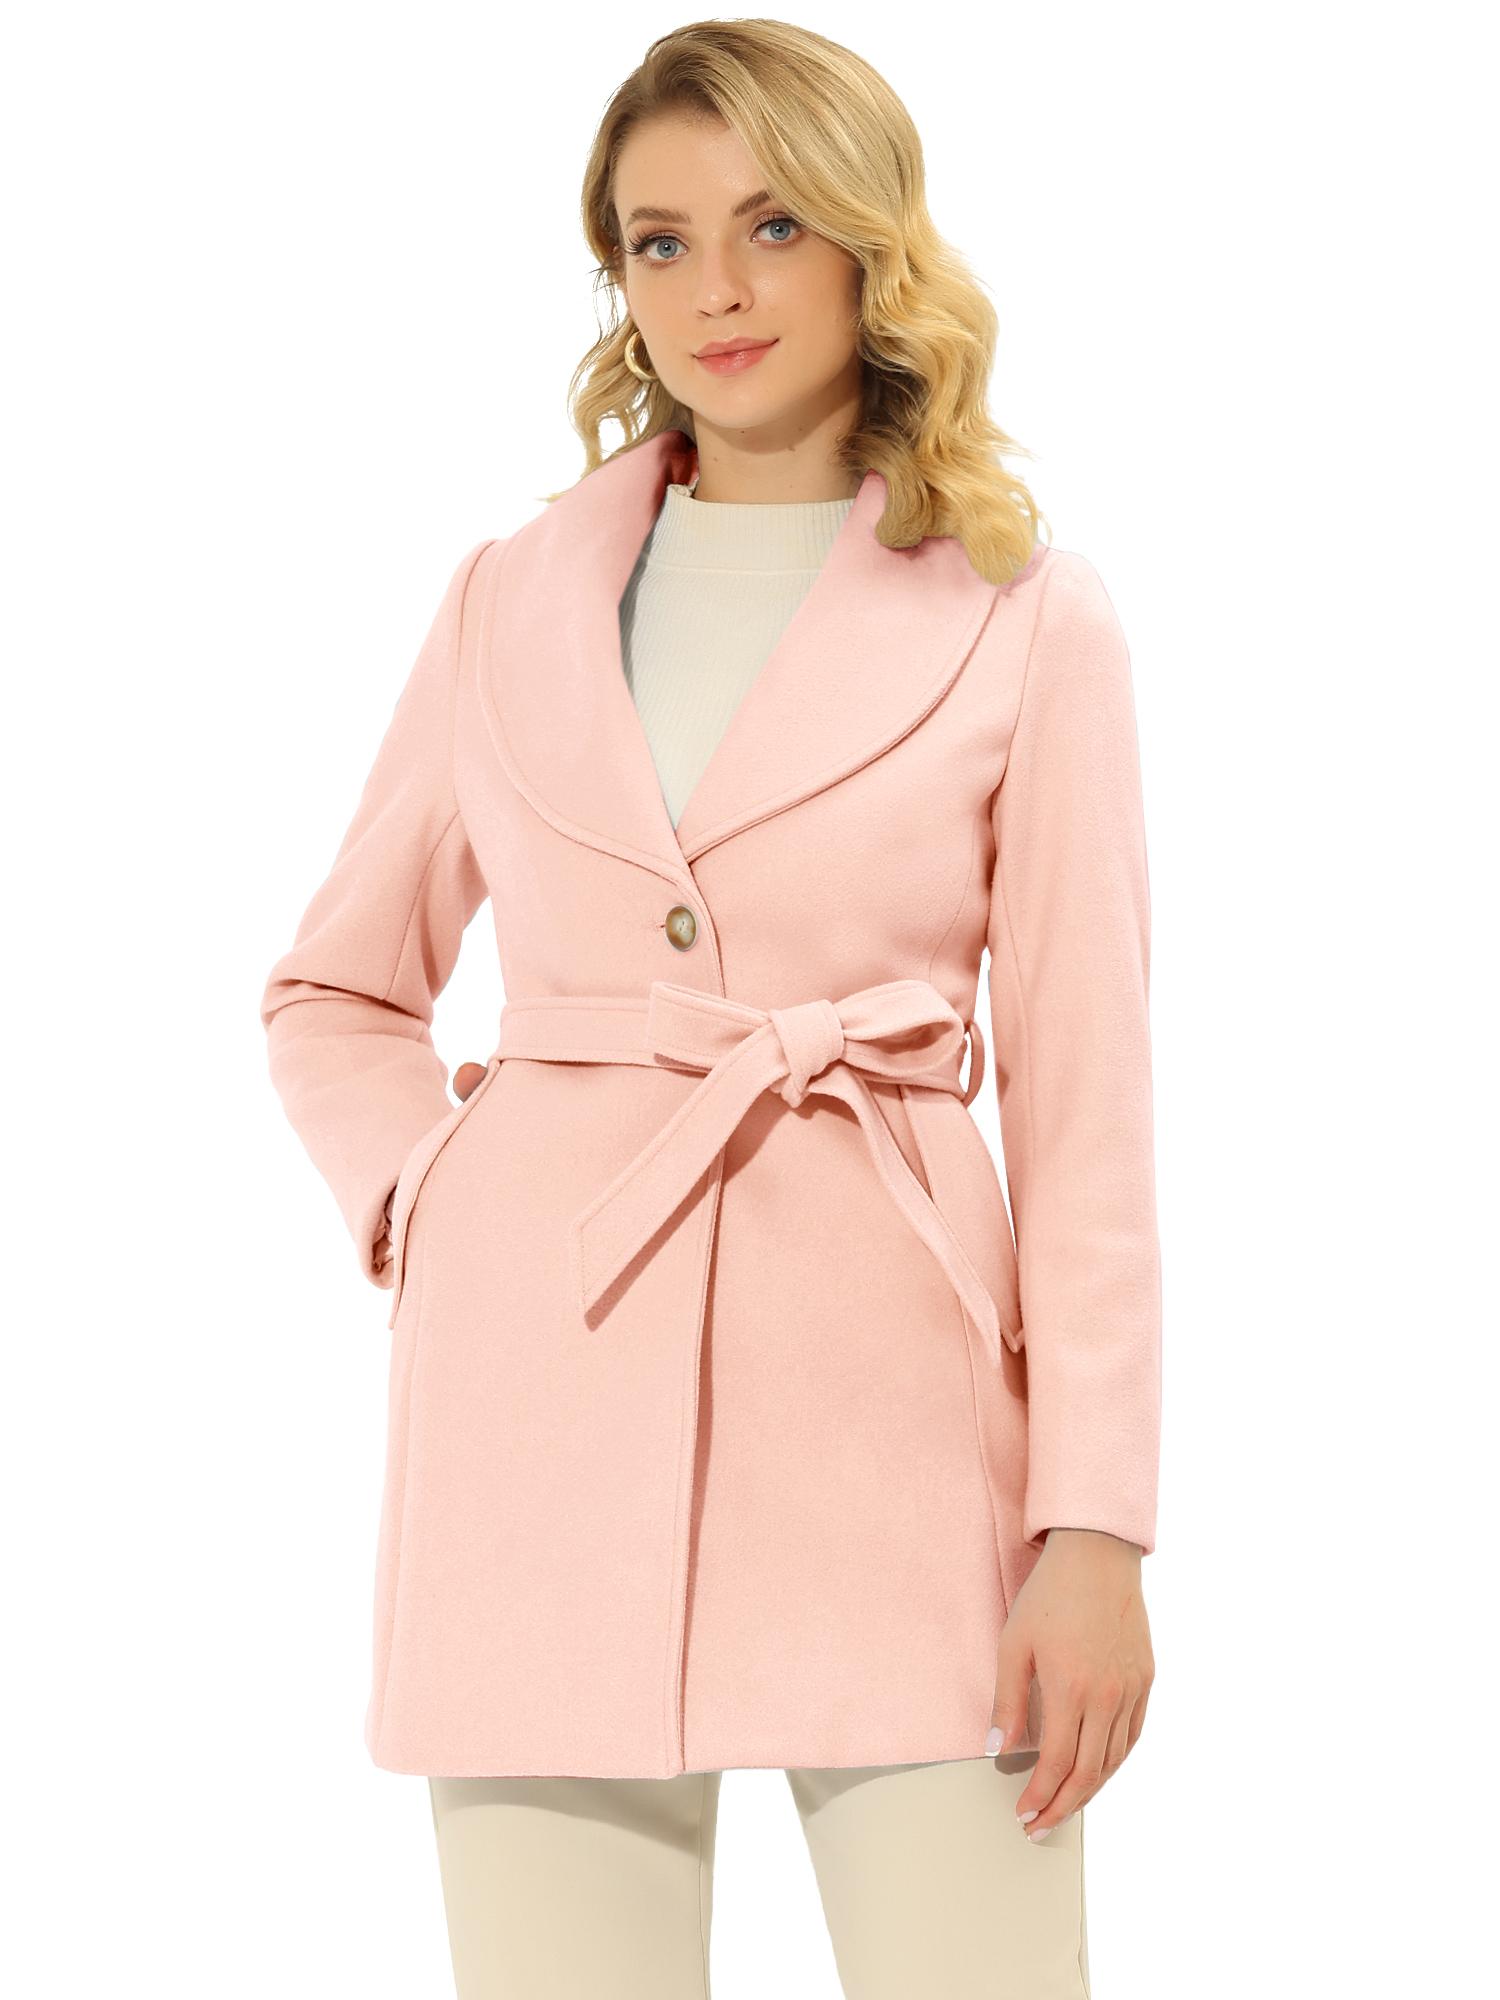 Allegra K Women's Casual Cute Slim Single Breasted Belt Coat Pink XL (US 18)